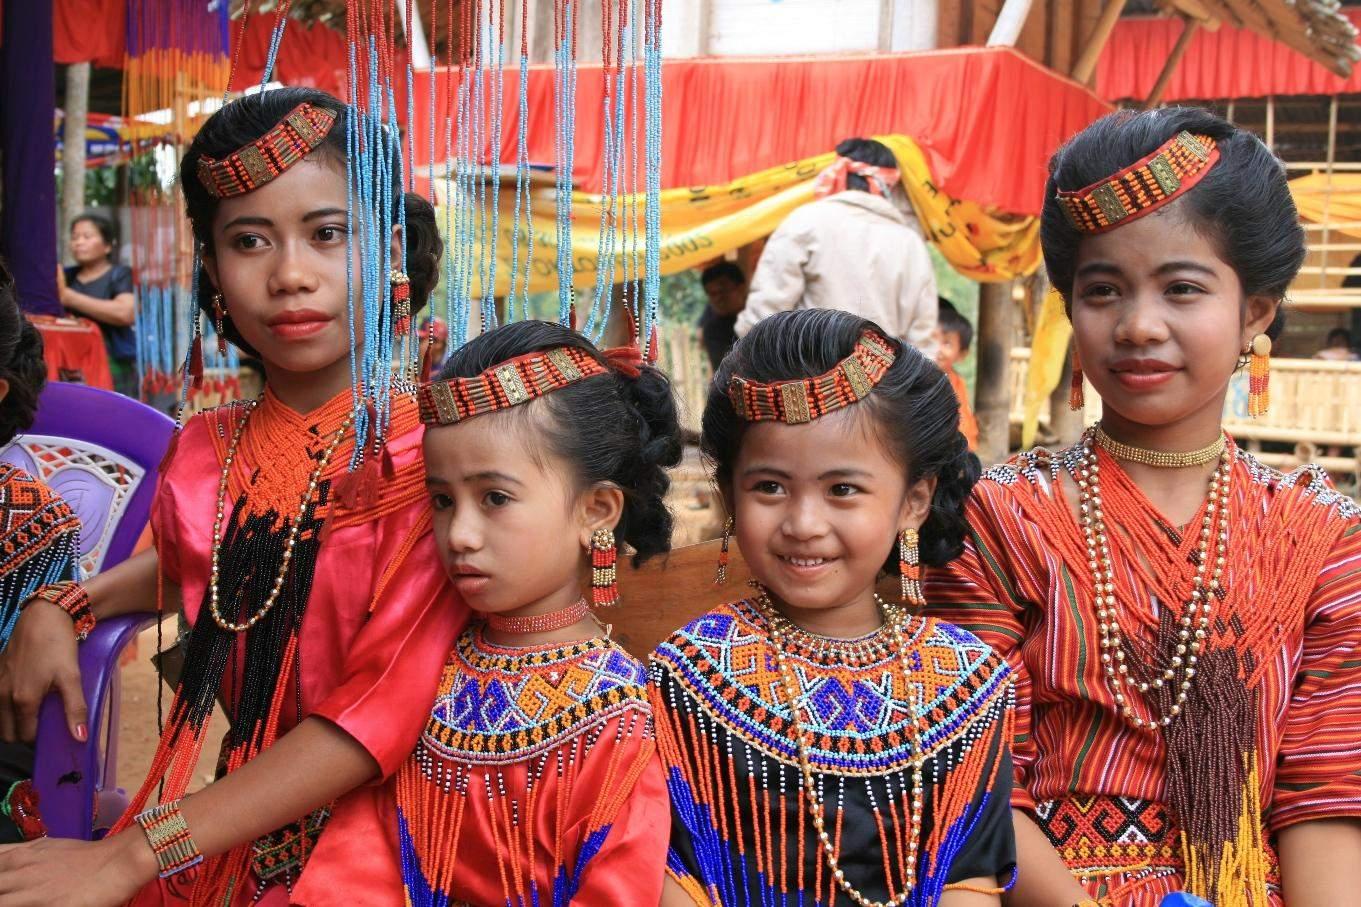 Indonesia Rituals Weddings And Funerals: Rites Of The Dead Of Tana Toraja » Tripfreakz.com